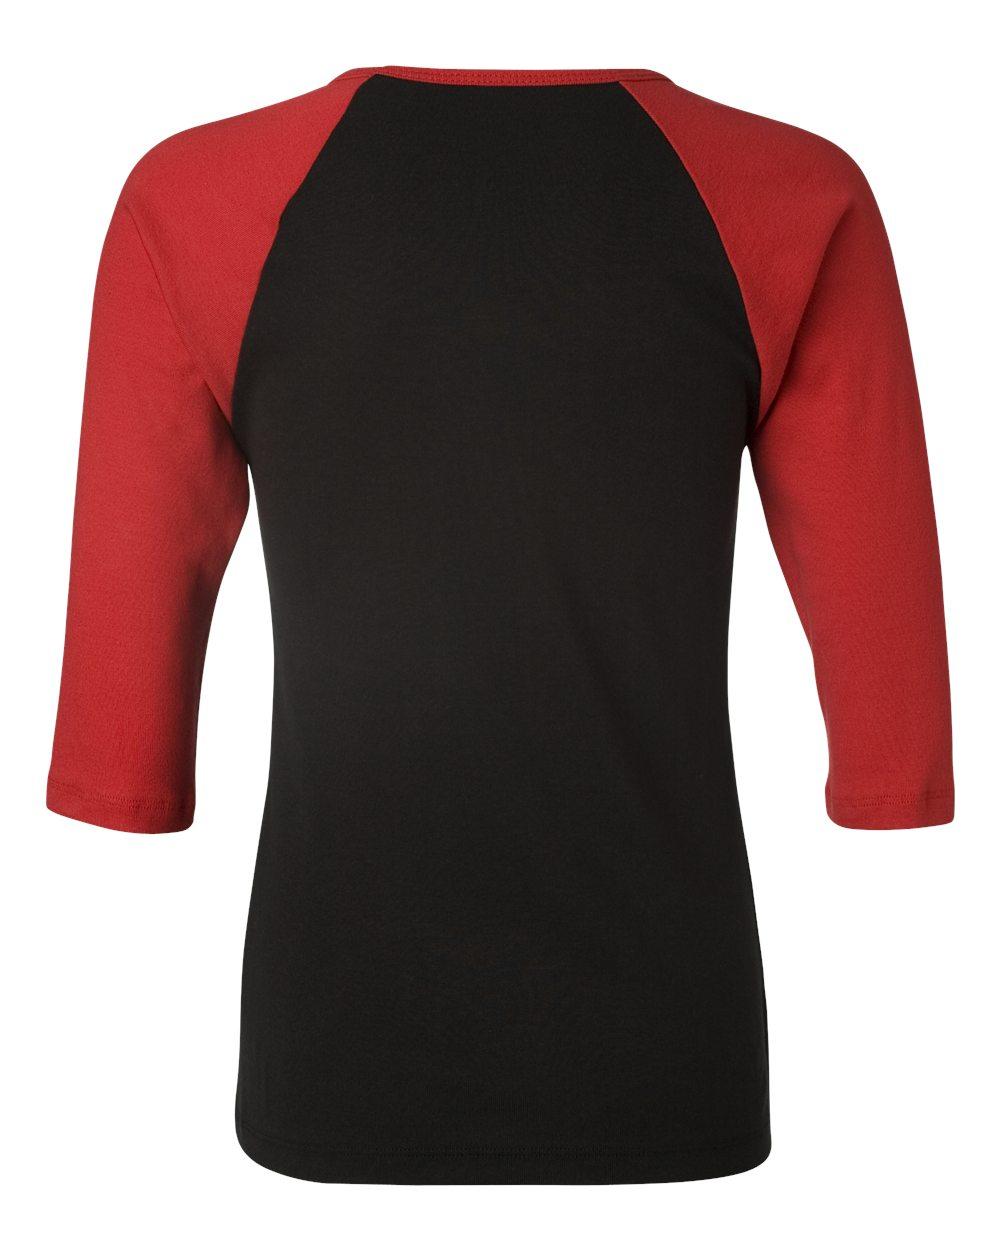 Bella-Canvas-Womens-Stretch-Rib-3-4-Sleeve-Contrast-Raglan-T-Shirt-B2000 thumbnail 8